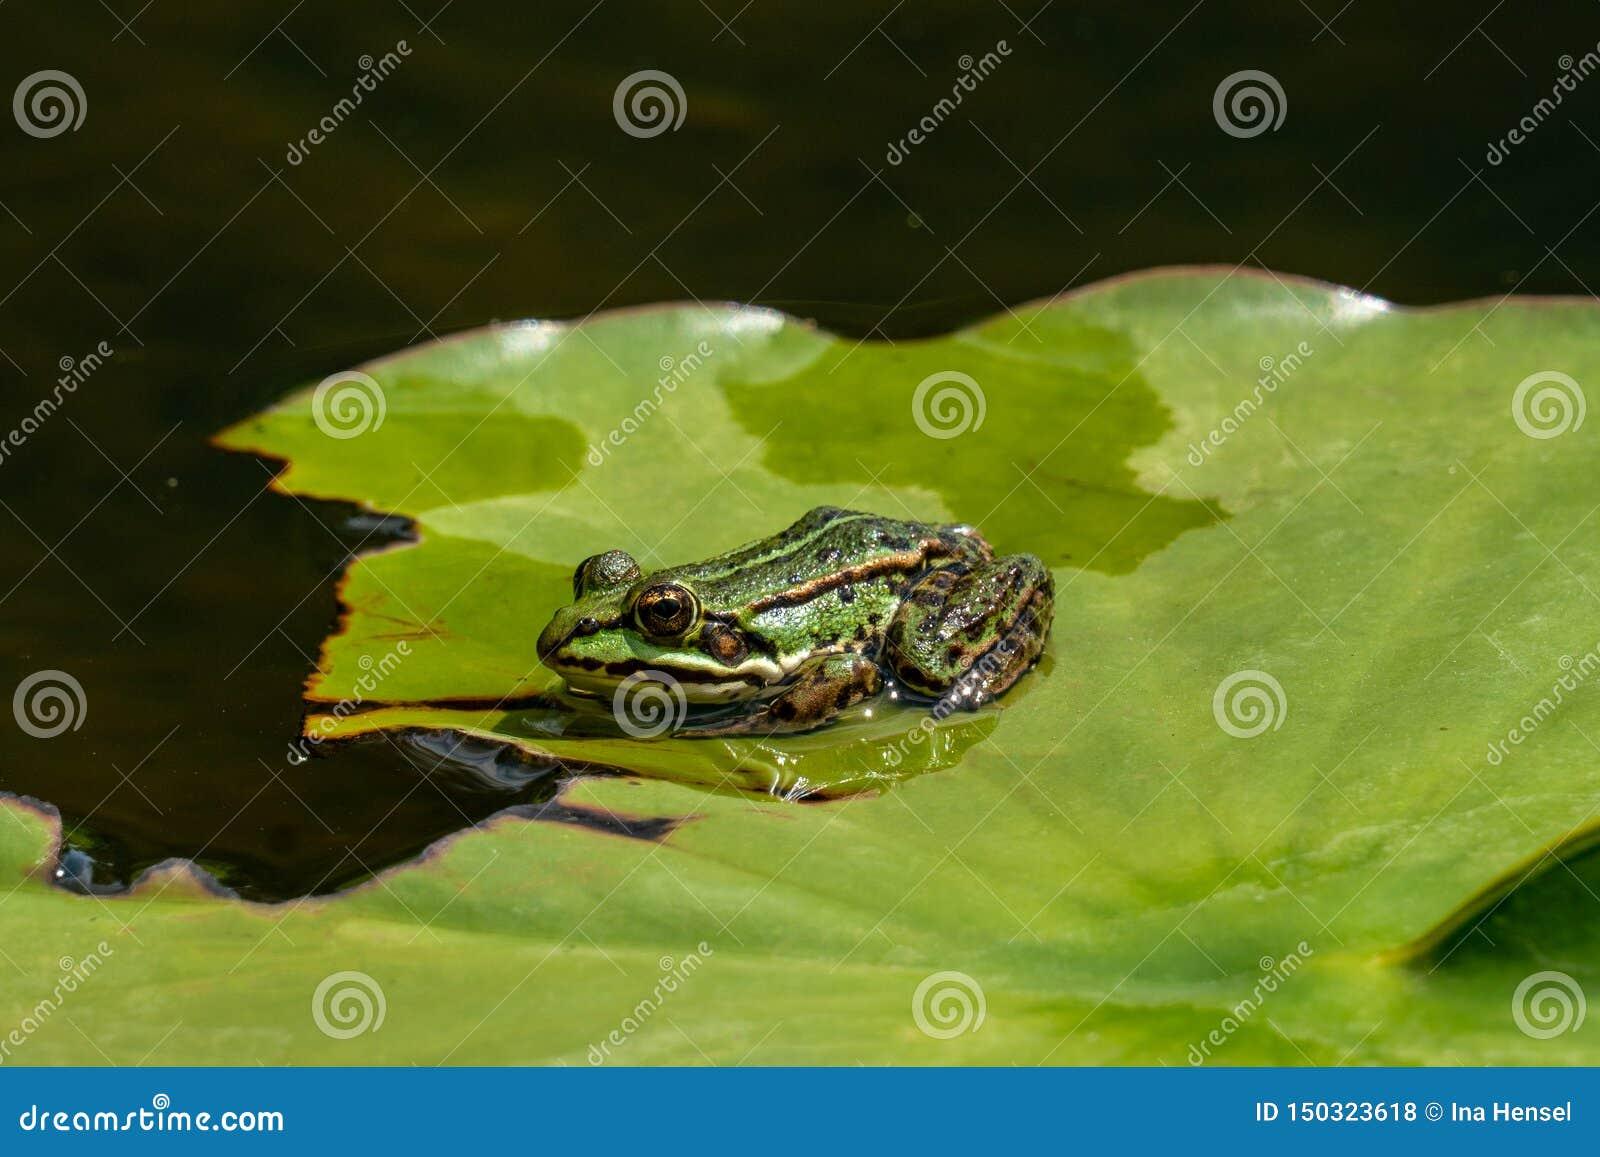 Esculenta- κοινός βάτραχος νερού Rana που κάνει ηλιοθεραπεία σε μια λίμνη